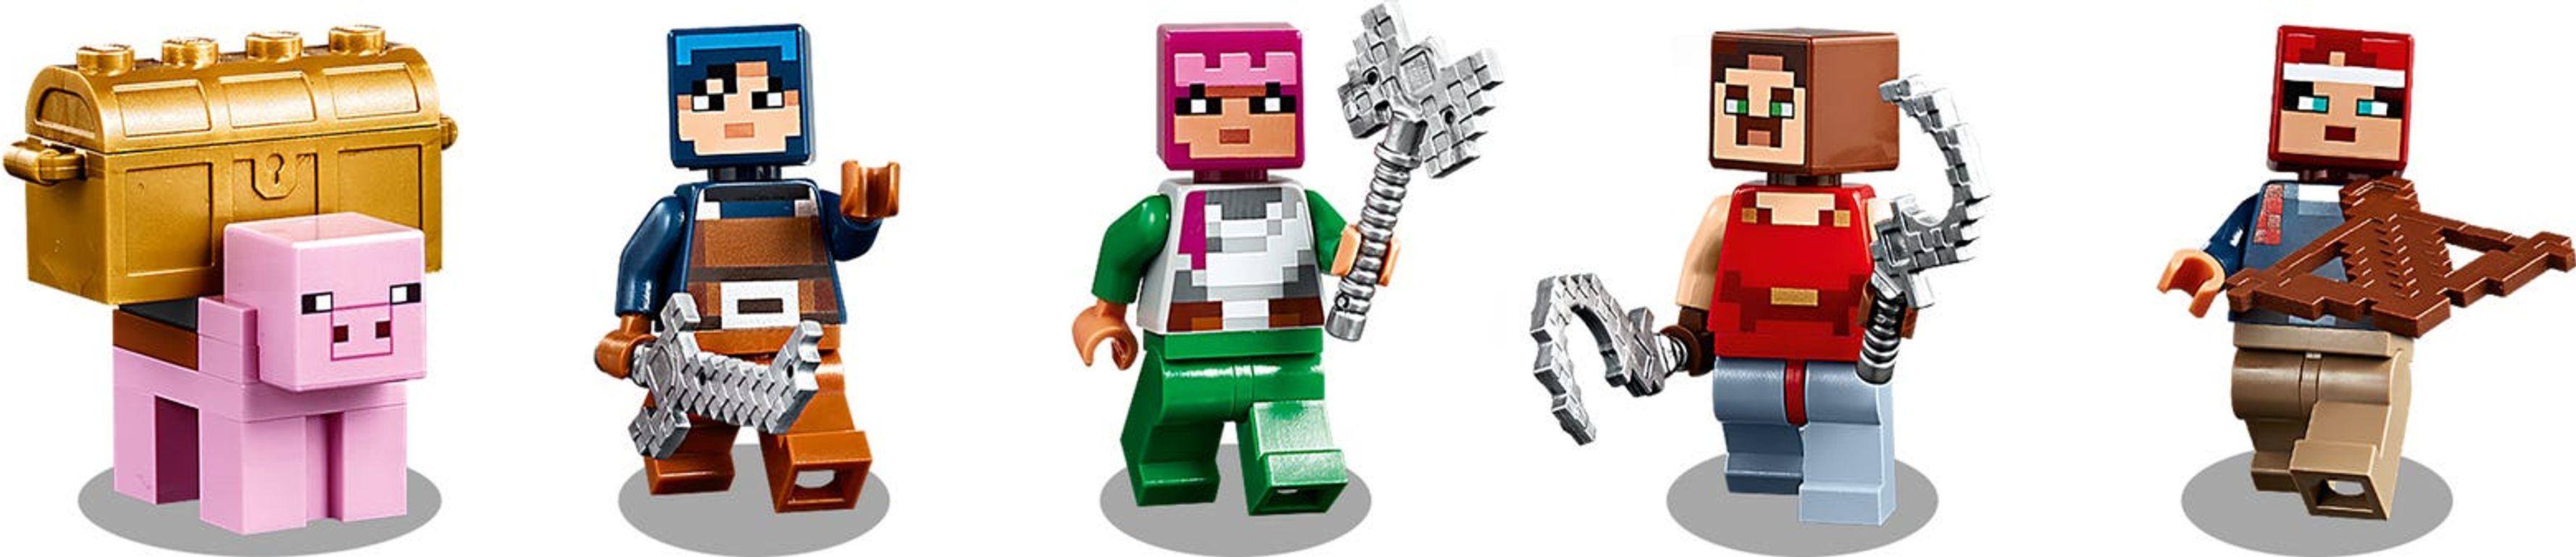 LEGO® Minecraft The Redstone Battle minifigures